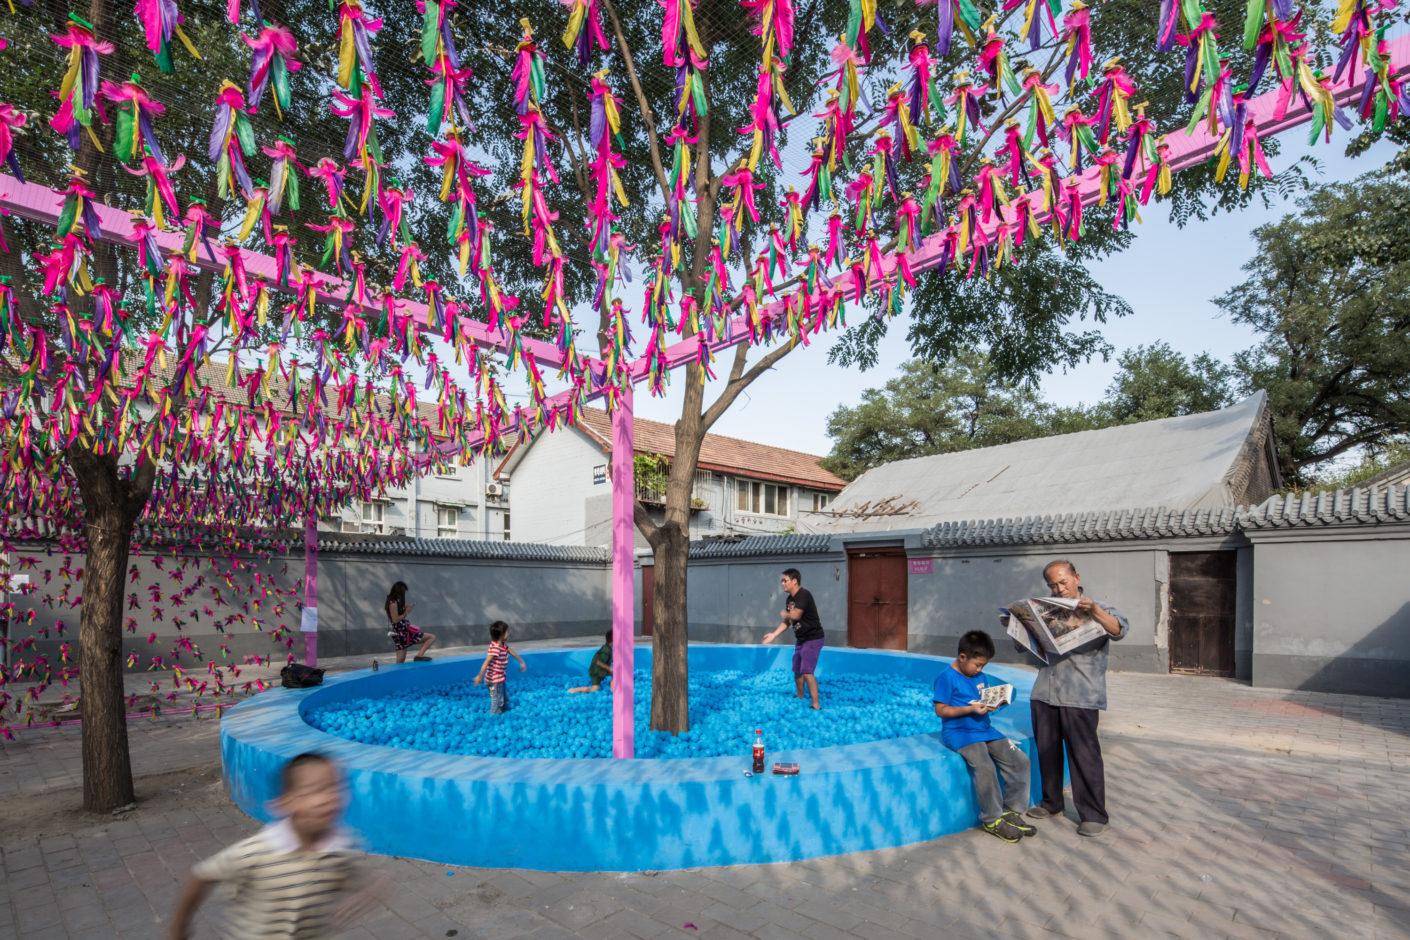 Baitasi Remade: Jianzi Box at Baitasi by SPARK Architects at Beijing Design Week